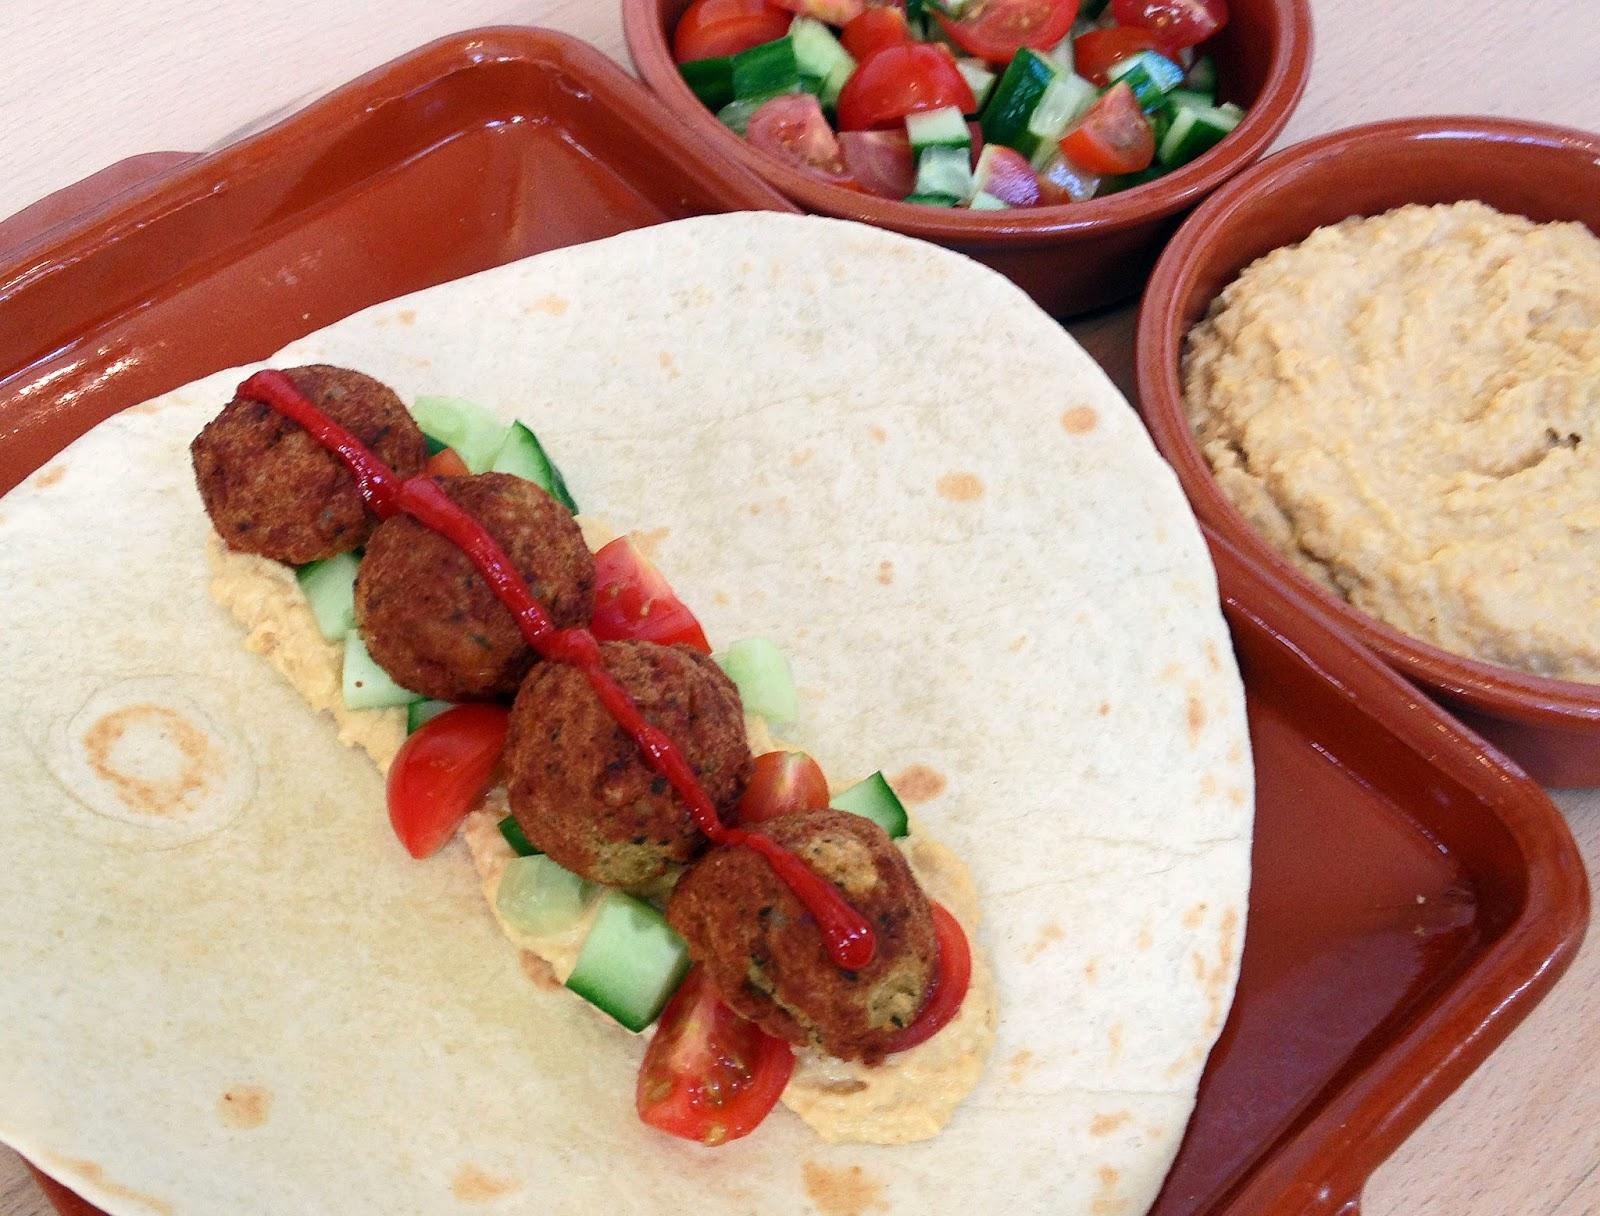 ... ideas for 1 week using flour tortillas. Day 2: Felafel and Hummus Wrap